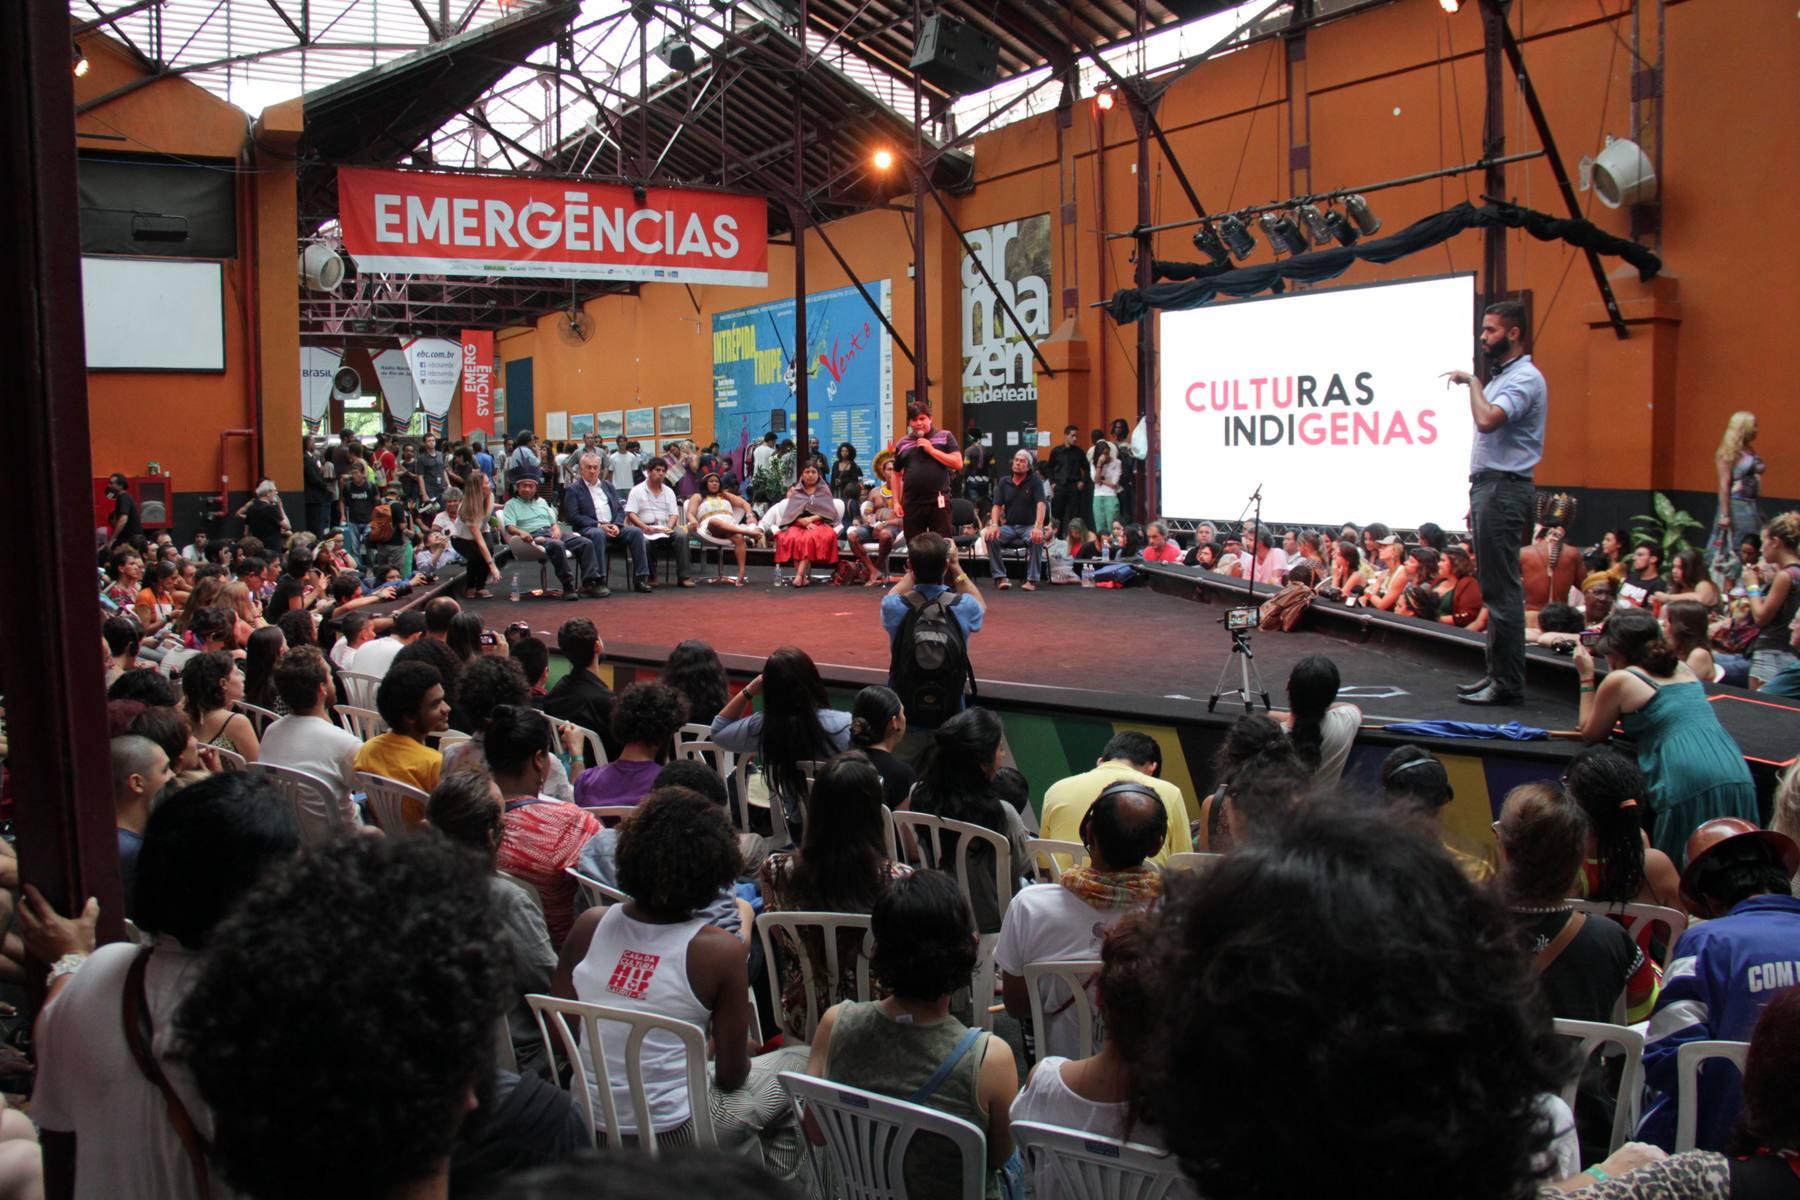 Emergencias_RJ_dez_2015_IMG_0220